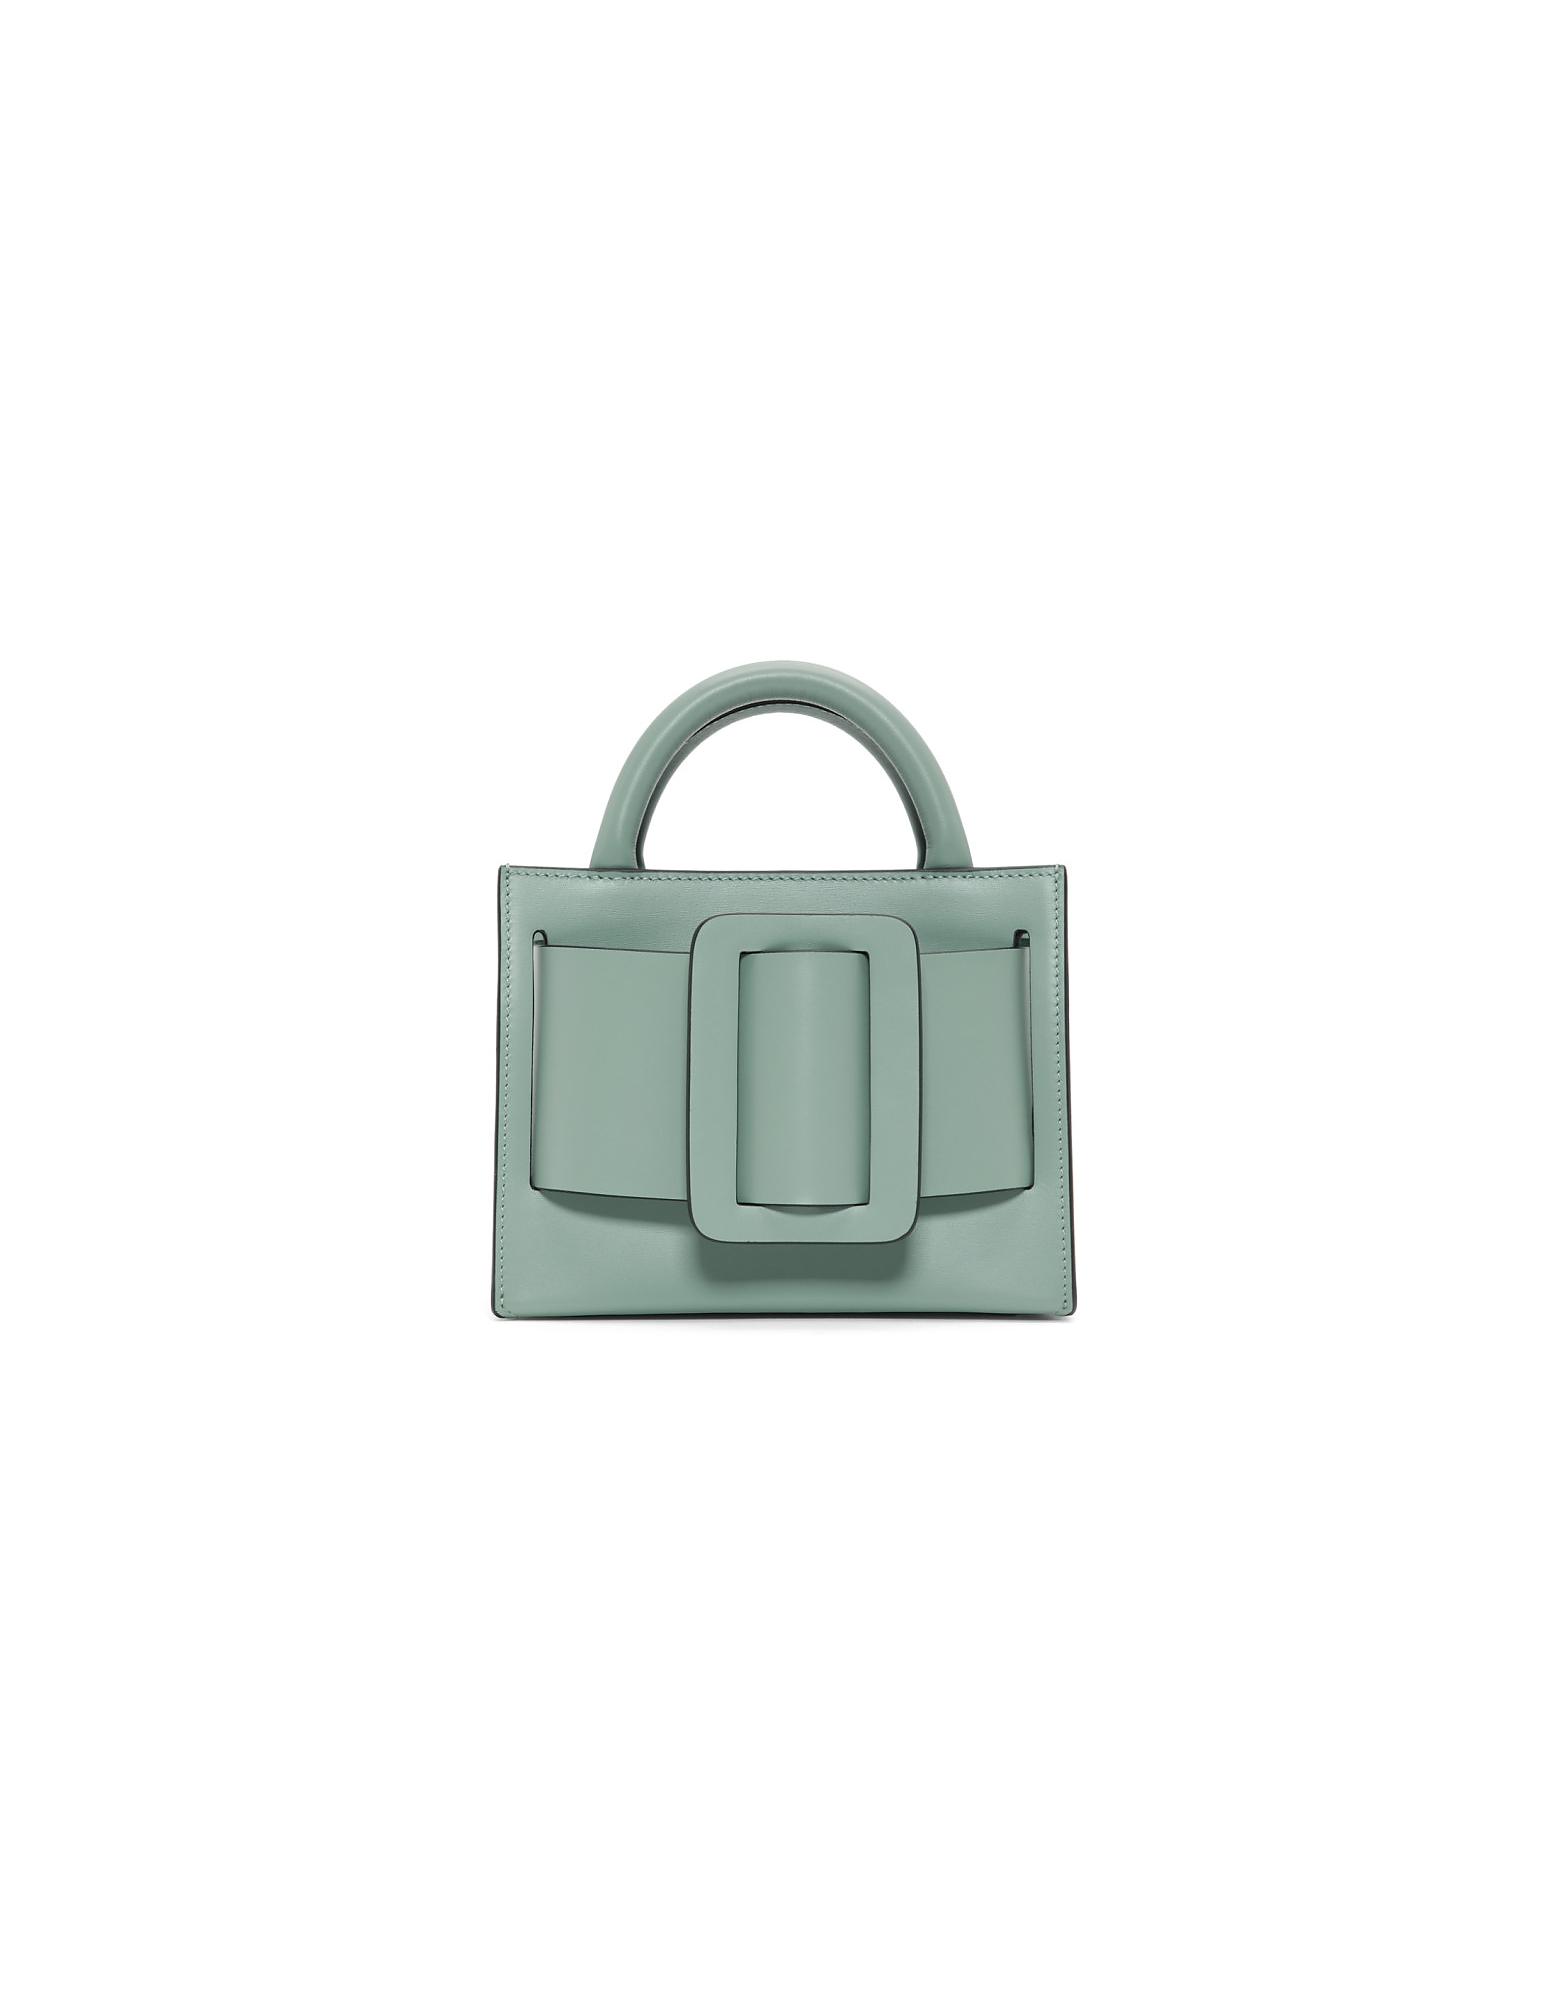 BOYY Designer Handbags, Blue Bobby 18 Bag